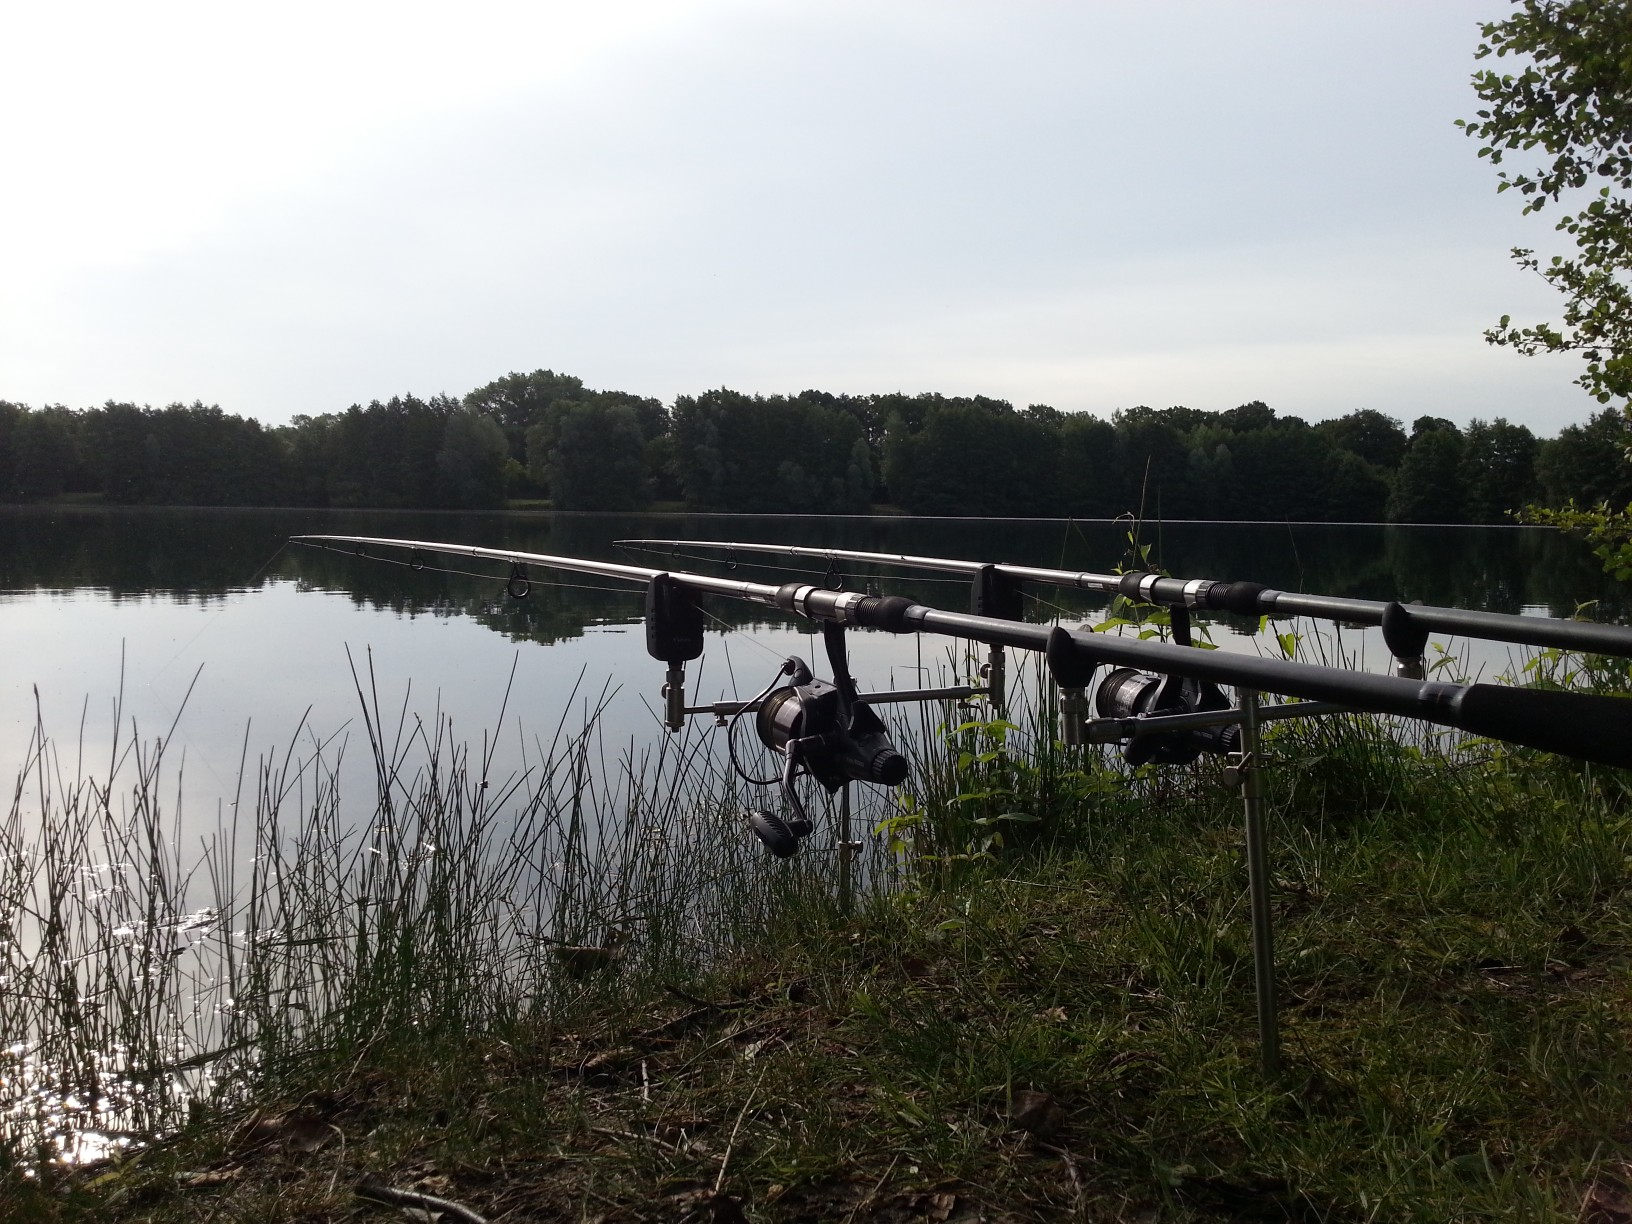 Sport-Fischerei-Verein Burgdorf e.V.